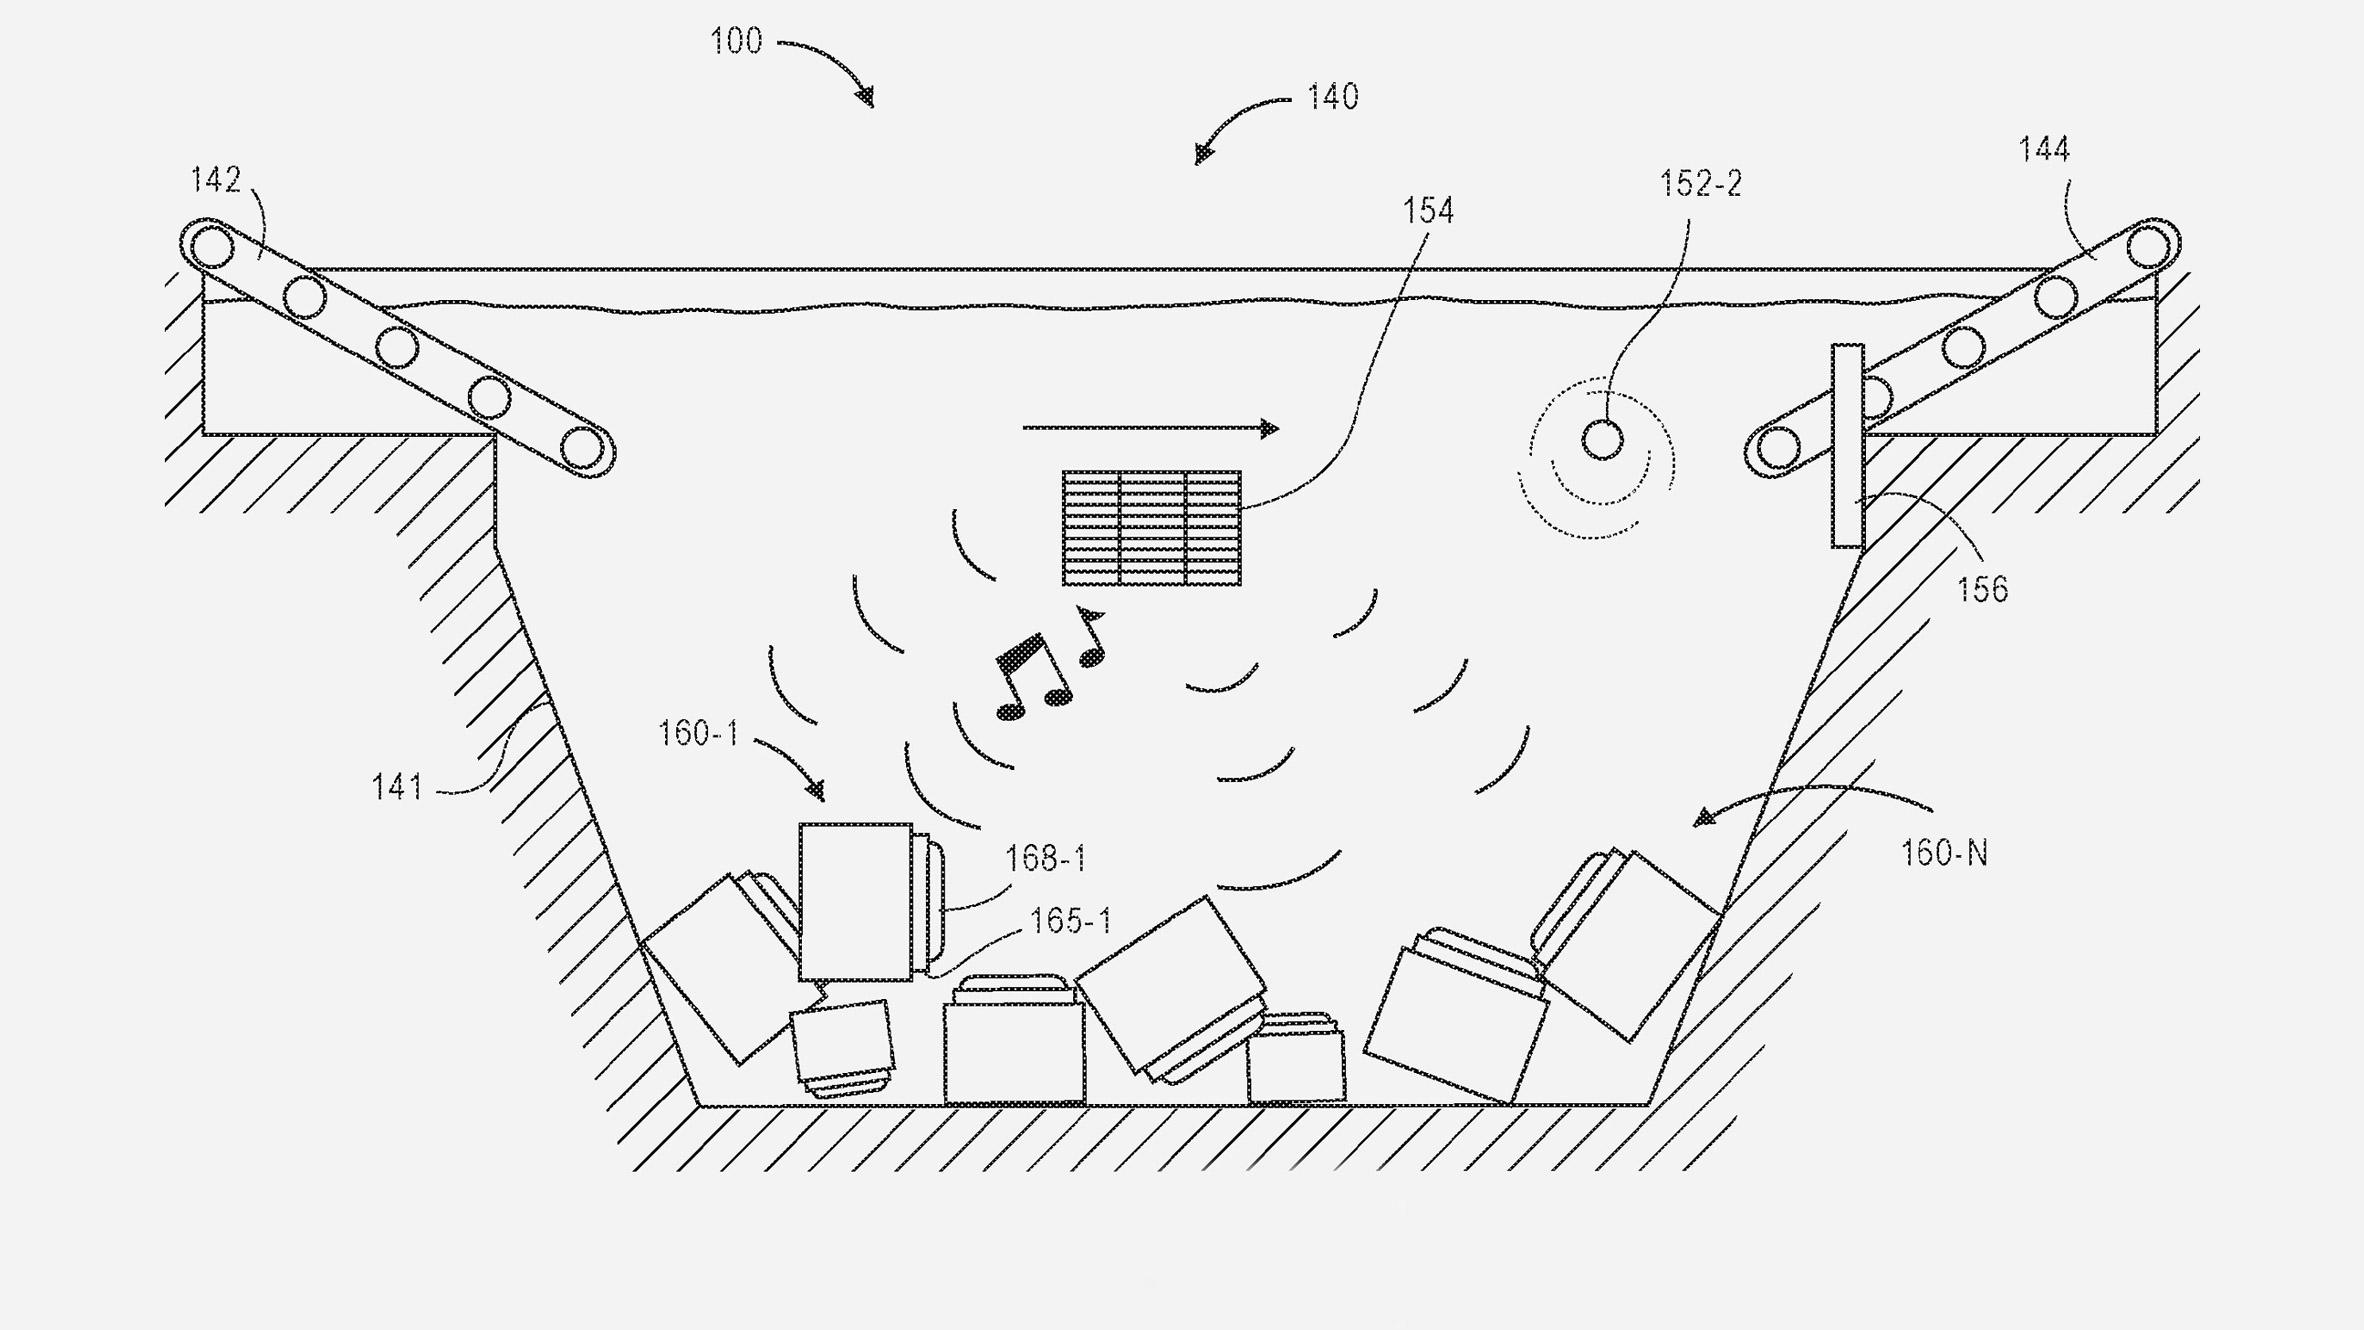 2364x1330 Amazon Files Patent For Underwater Warehouses